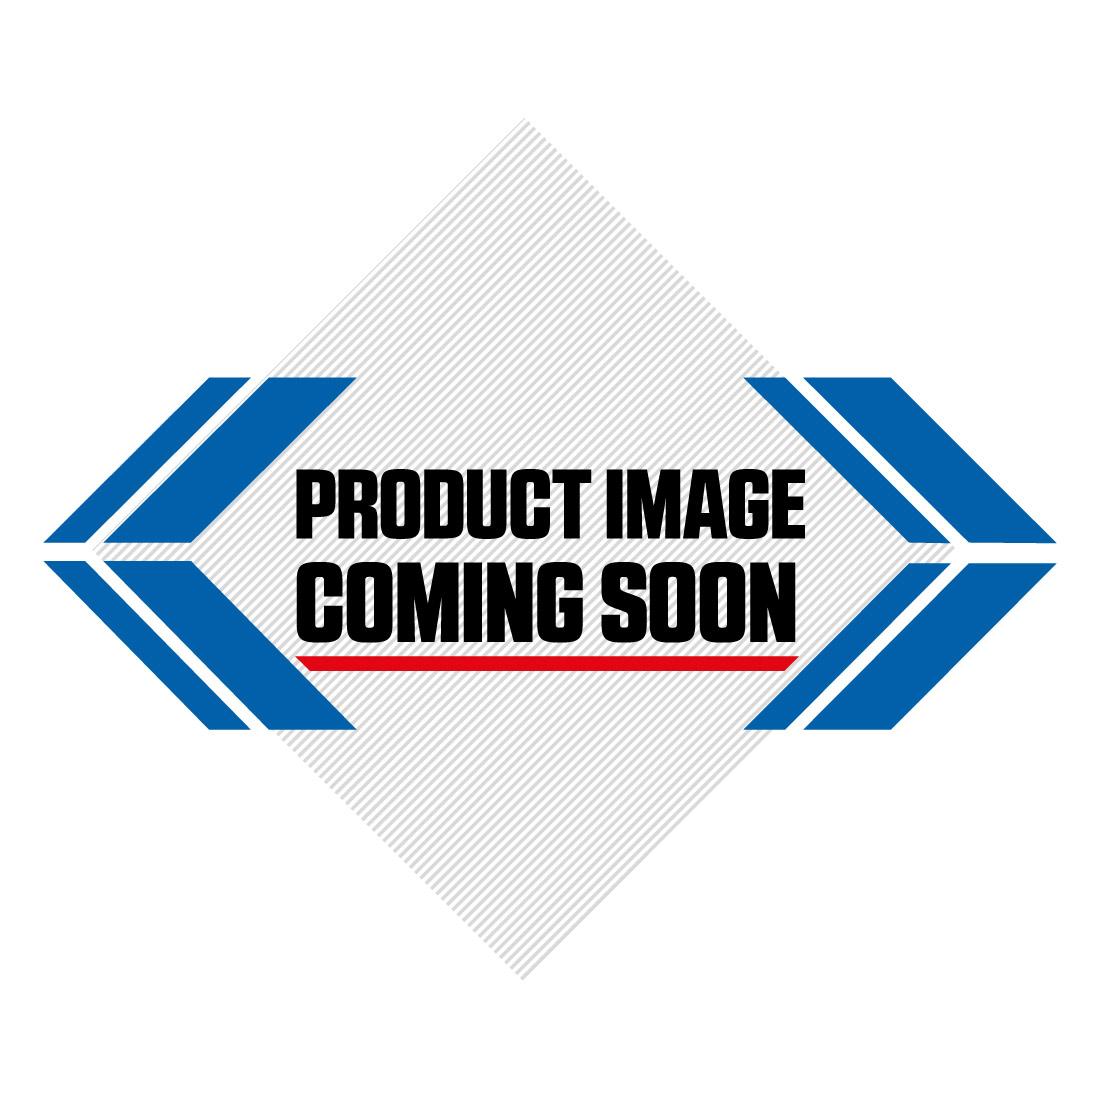 Renthal Twinring Rear Sprocket KTM SX SX-F EXC EXC-F Husqvarna TC FC TE FE - Orange Image-4